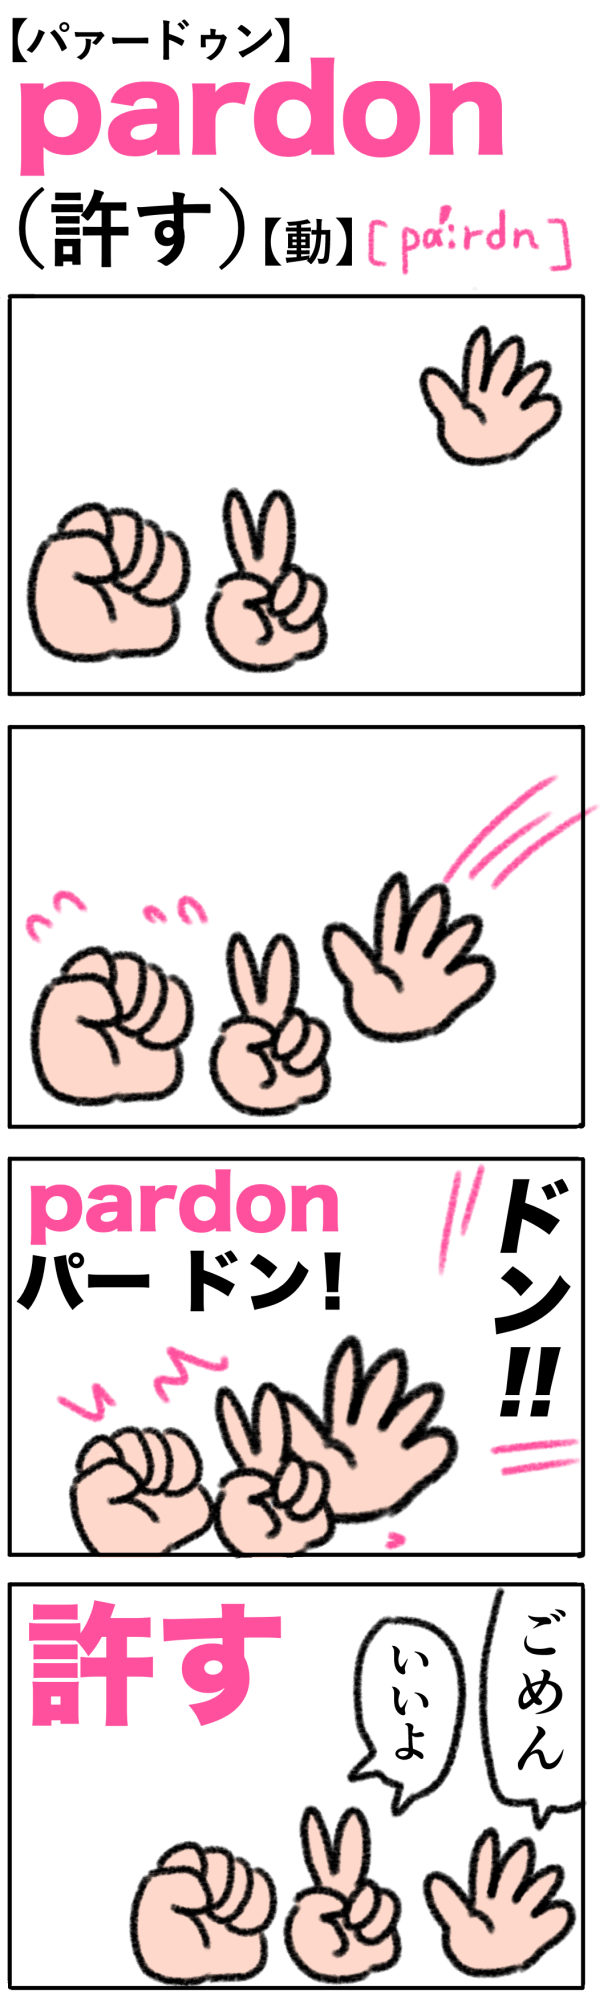 pardon(許す)の語呂合わせ英単語